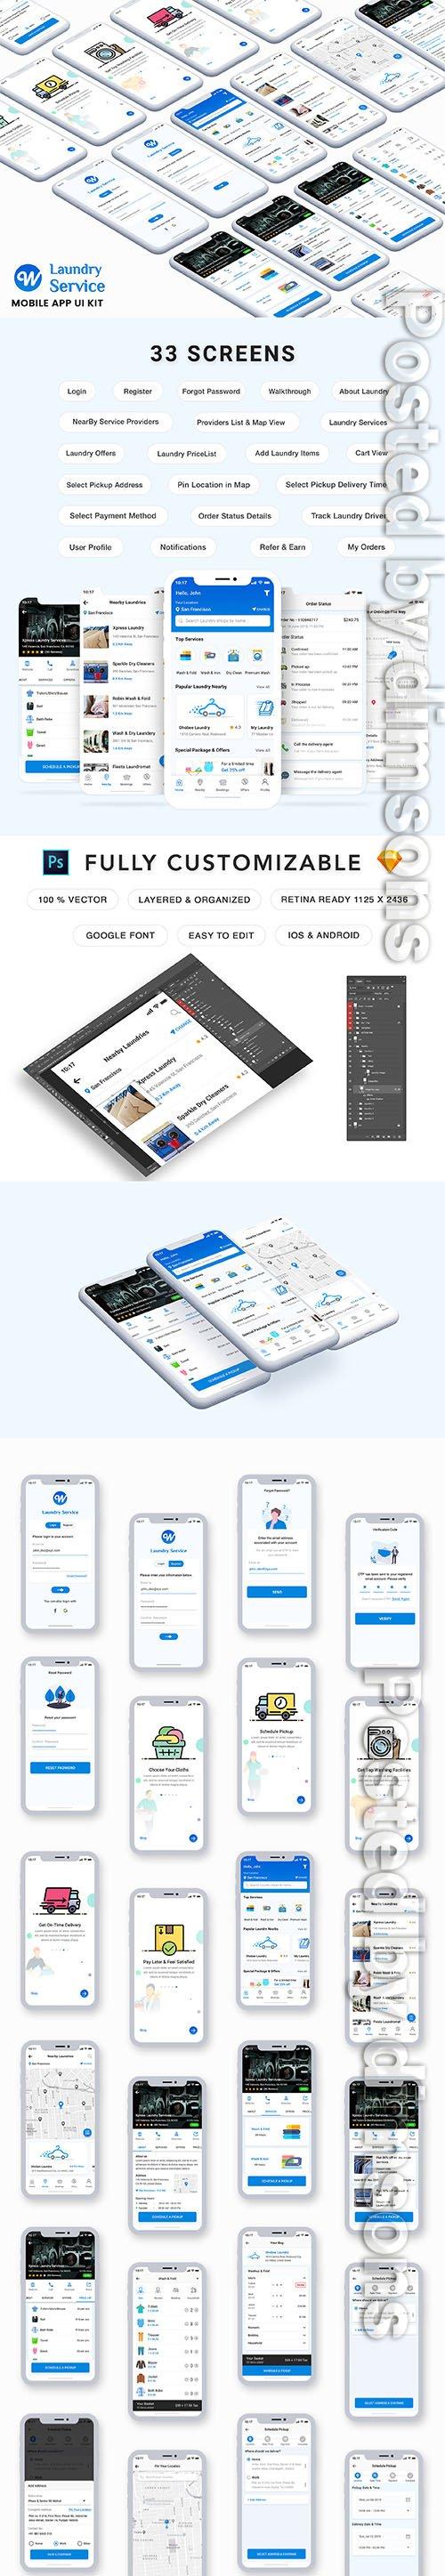 Wash It : Laundry App UI Kit - UI8